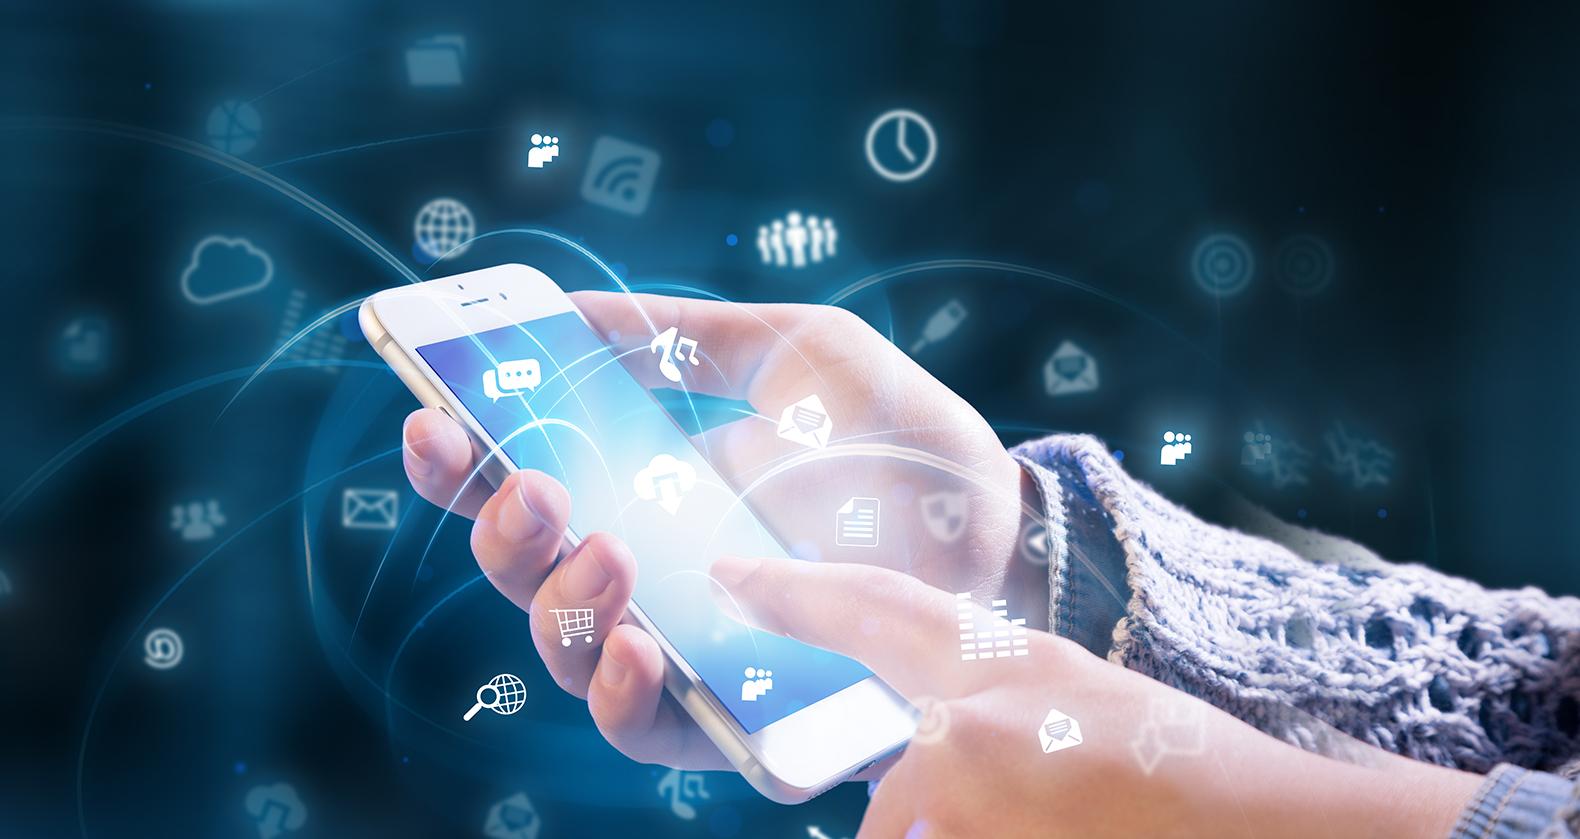 Digital Marketing for Apps